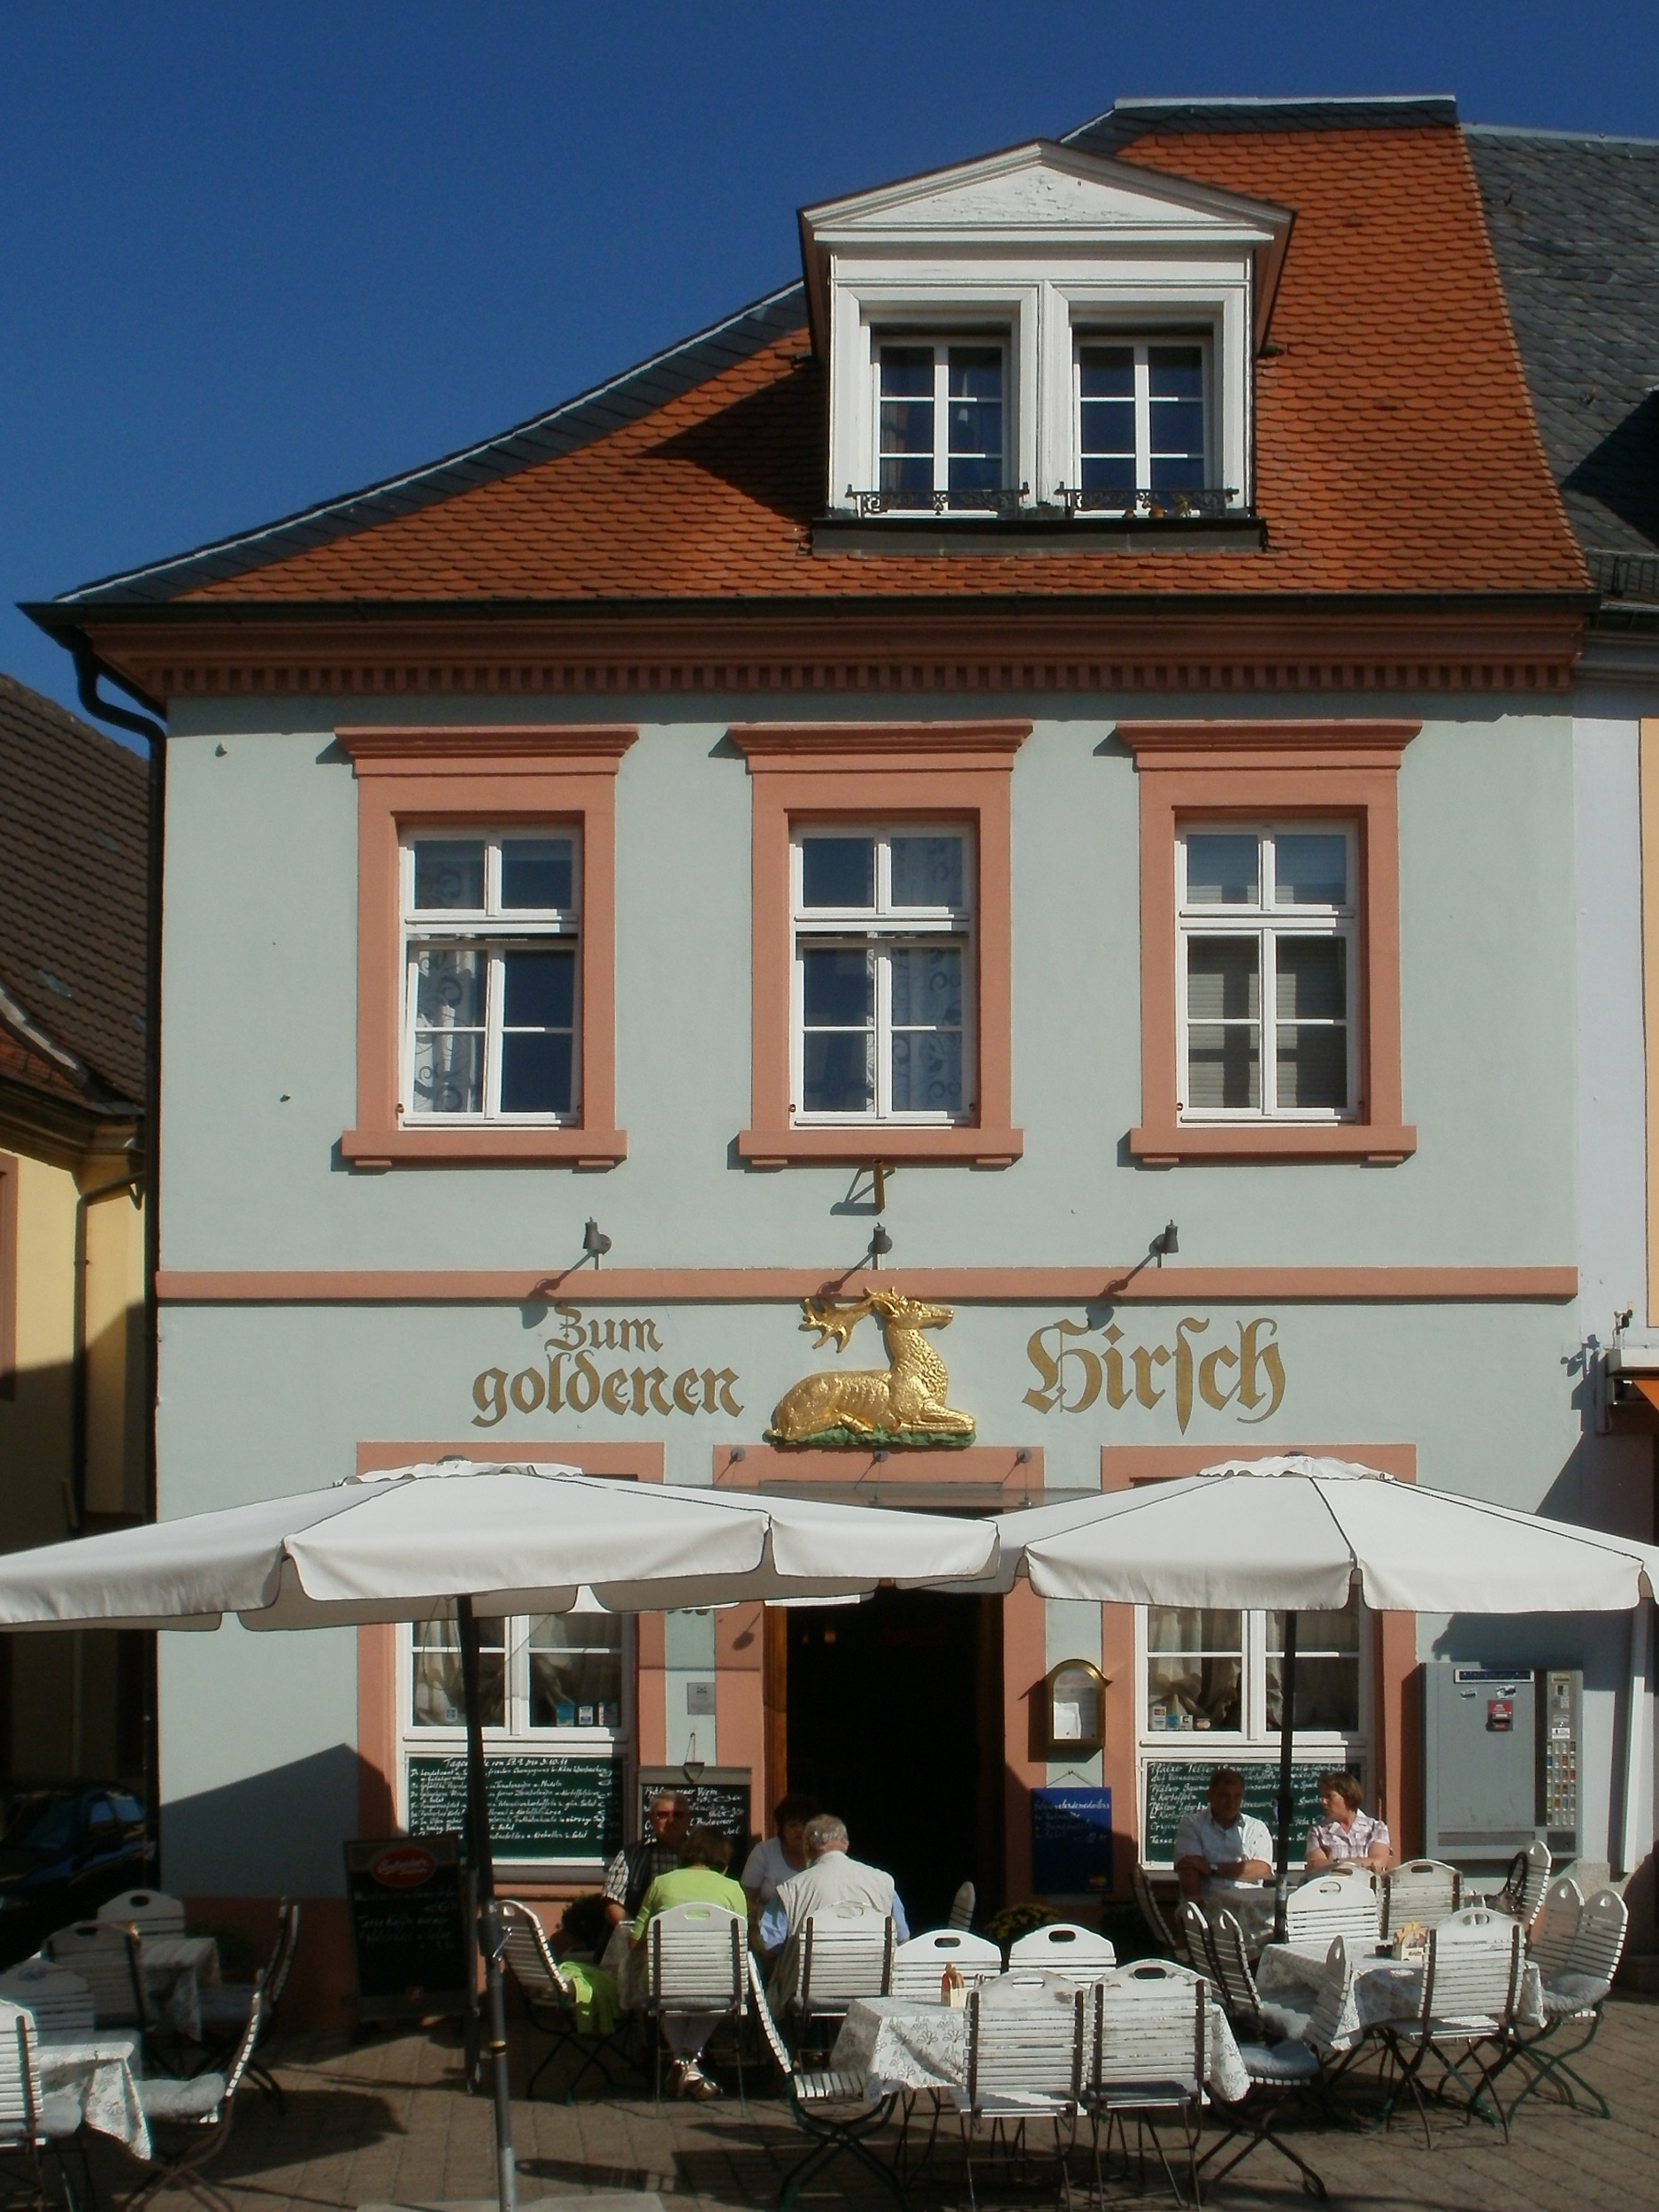 File20111003zum Goldenen Hirsch Speyer1jpg Wikimedia Commons